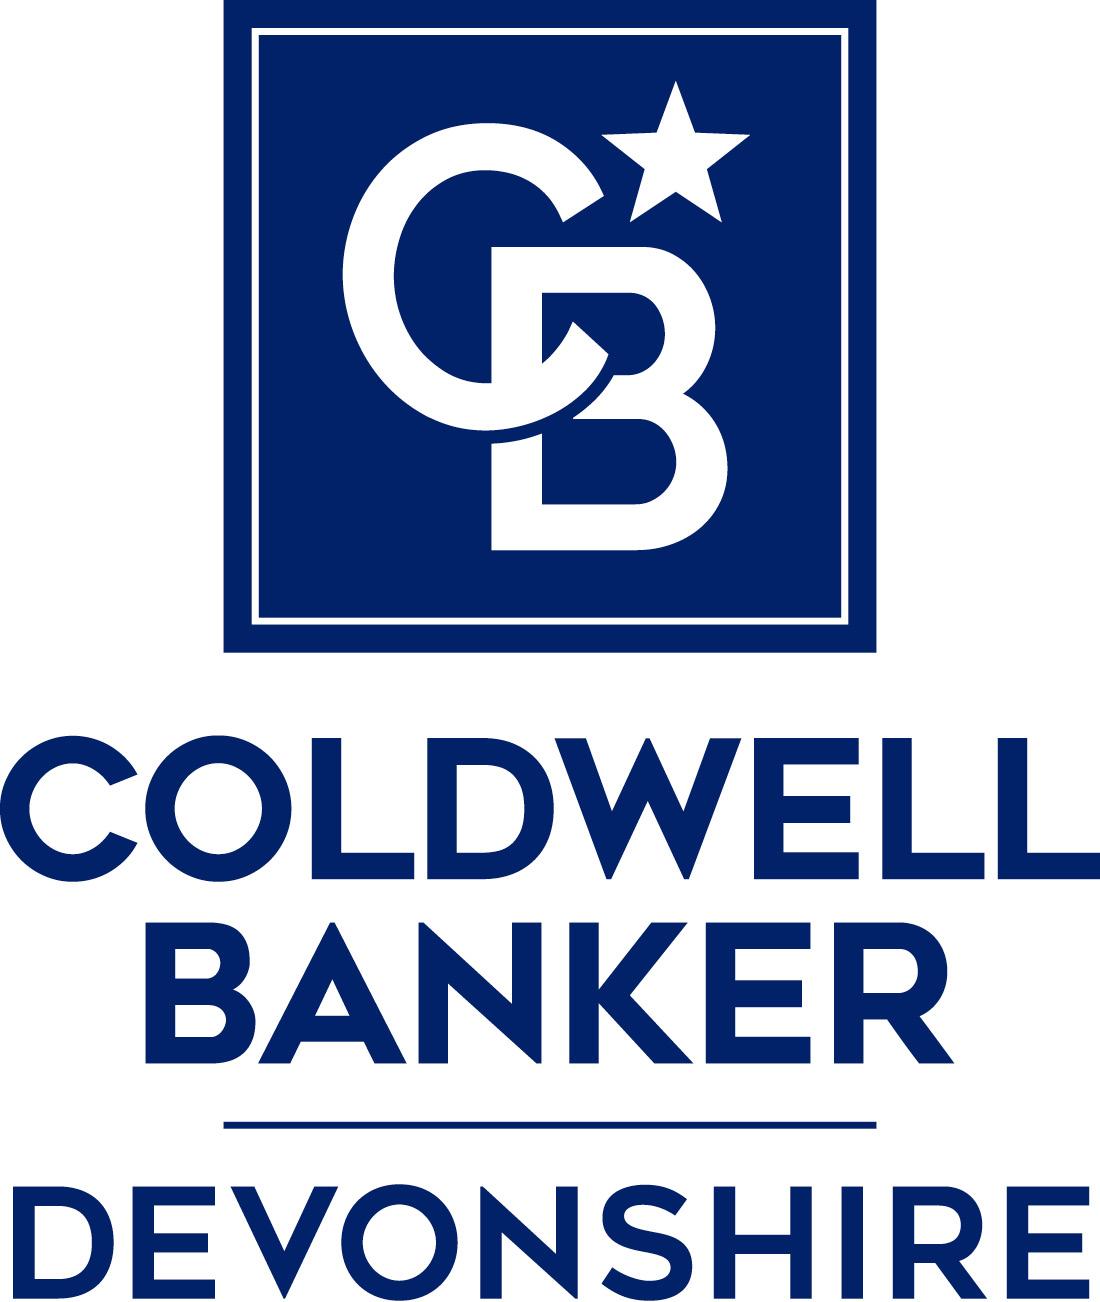 Coldwell Banker Devonshire